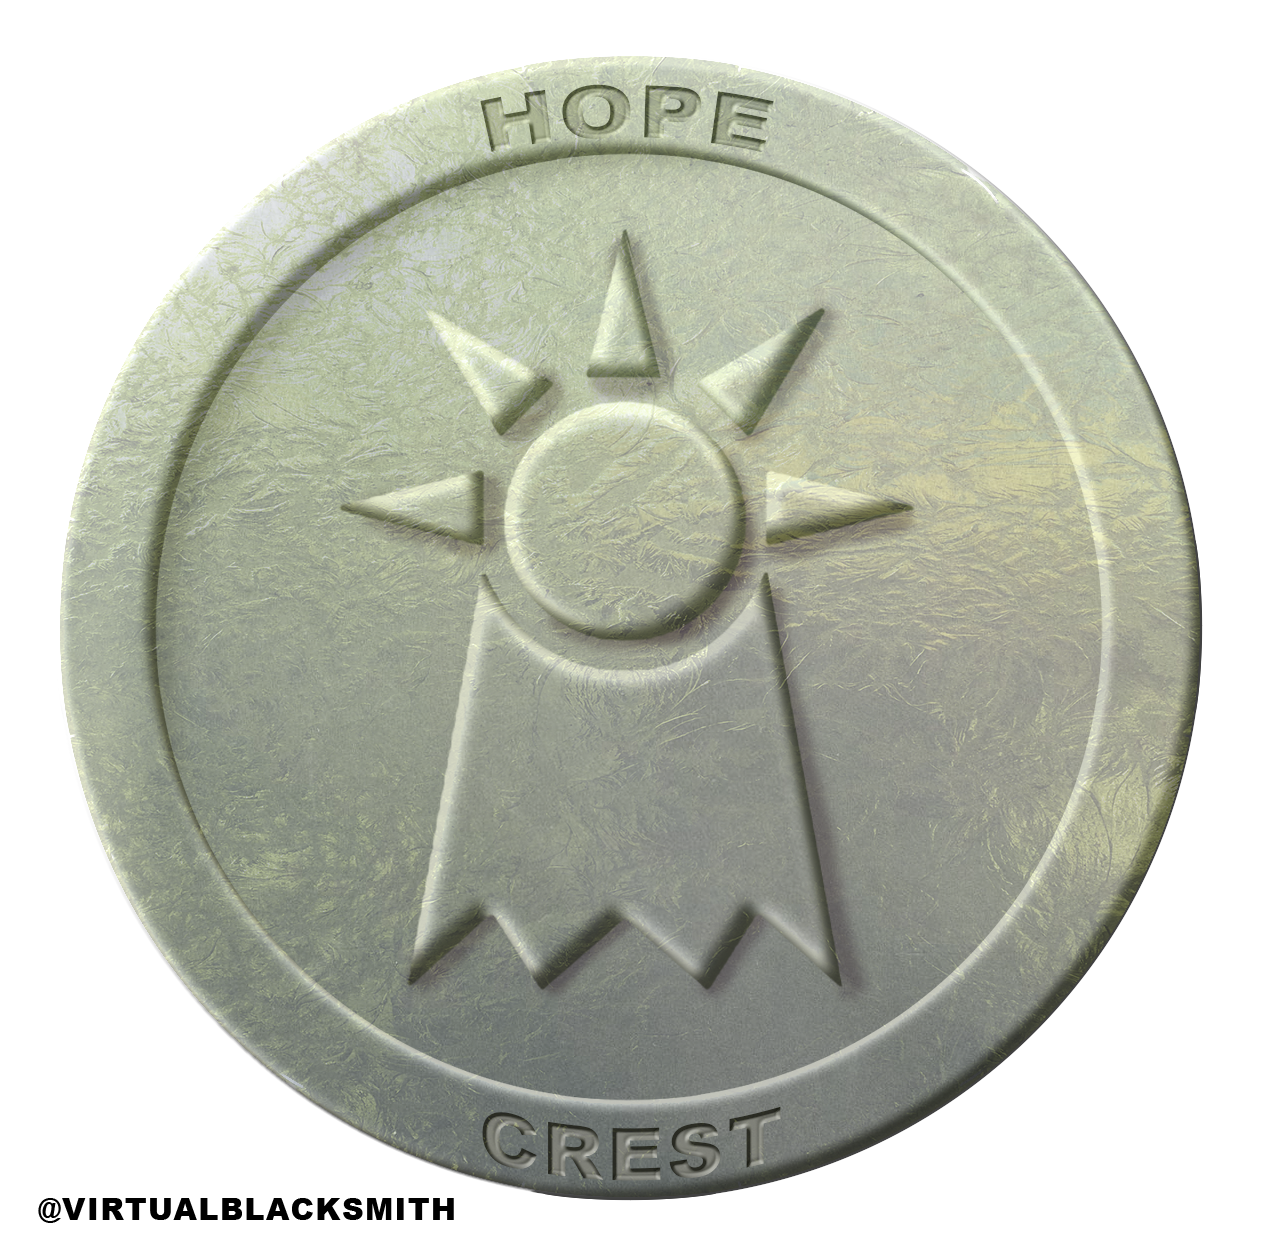 Hope Crest